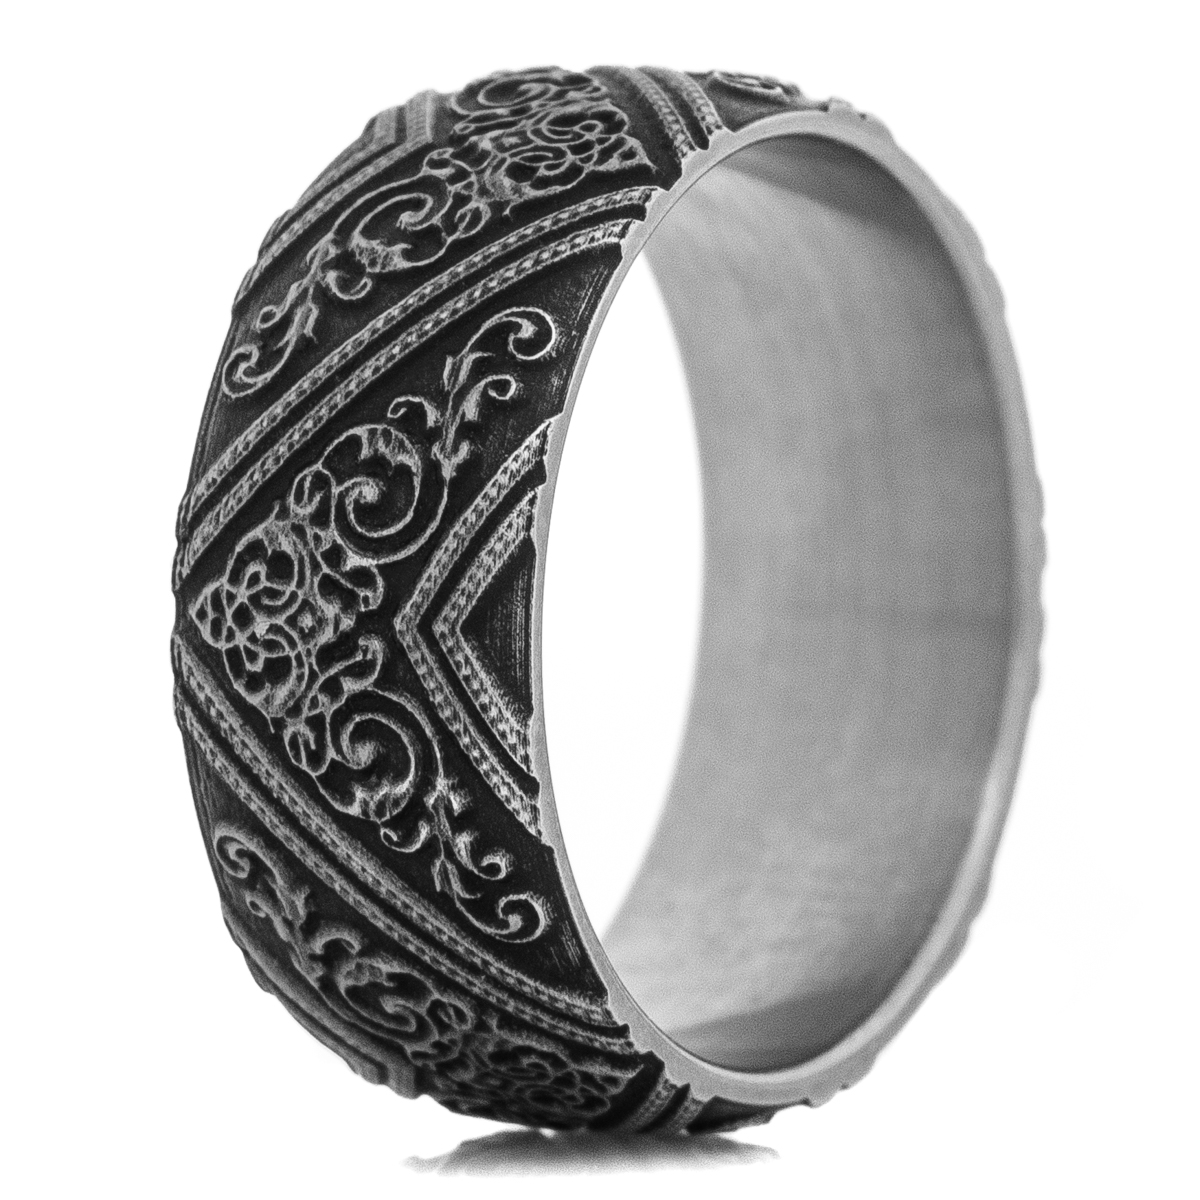 Men's Titanium King Arthur Battle Worn Ring